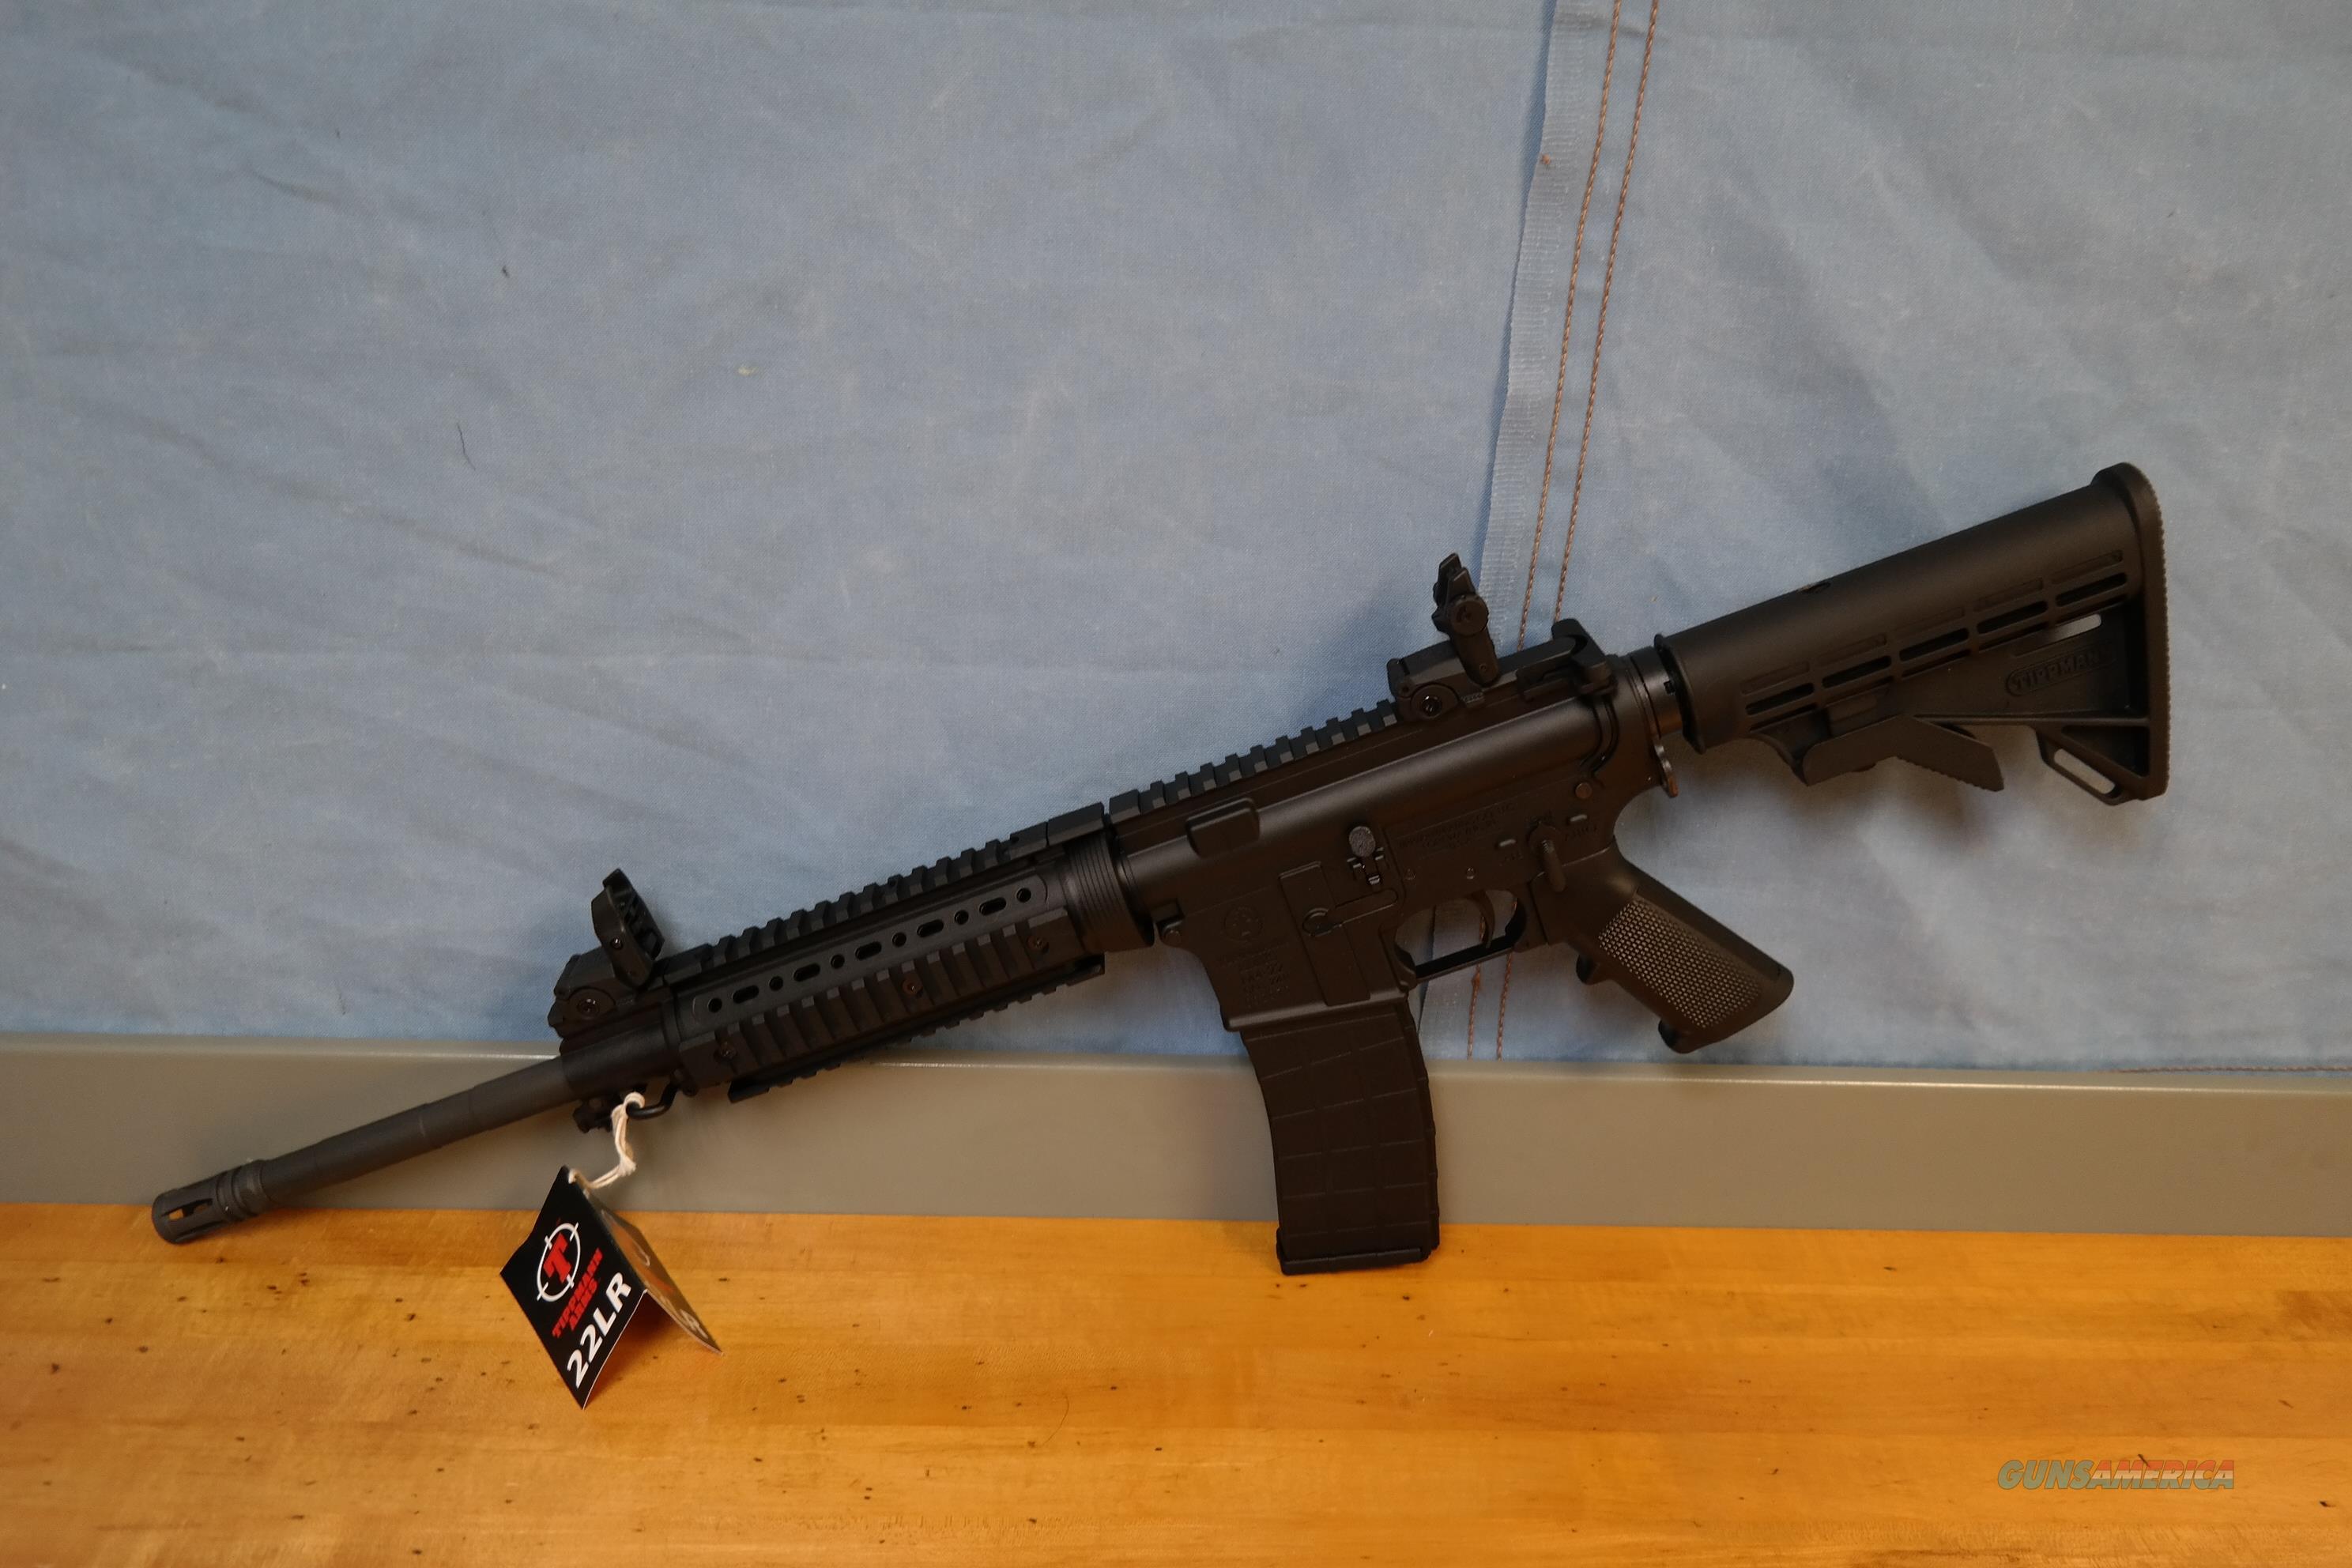 Tippmann M4 22 Classic  Guns > Rifles > AR-15 Rifles - Small Manufacturers > Complete Rifle